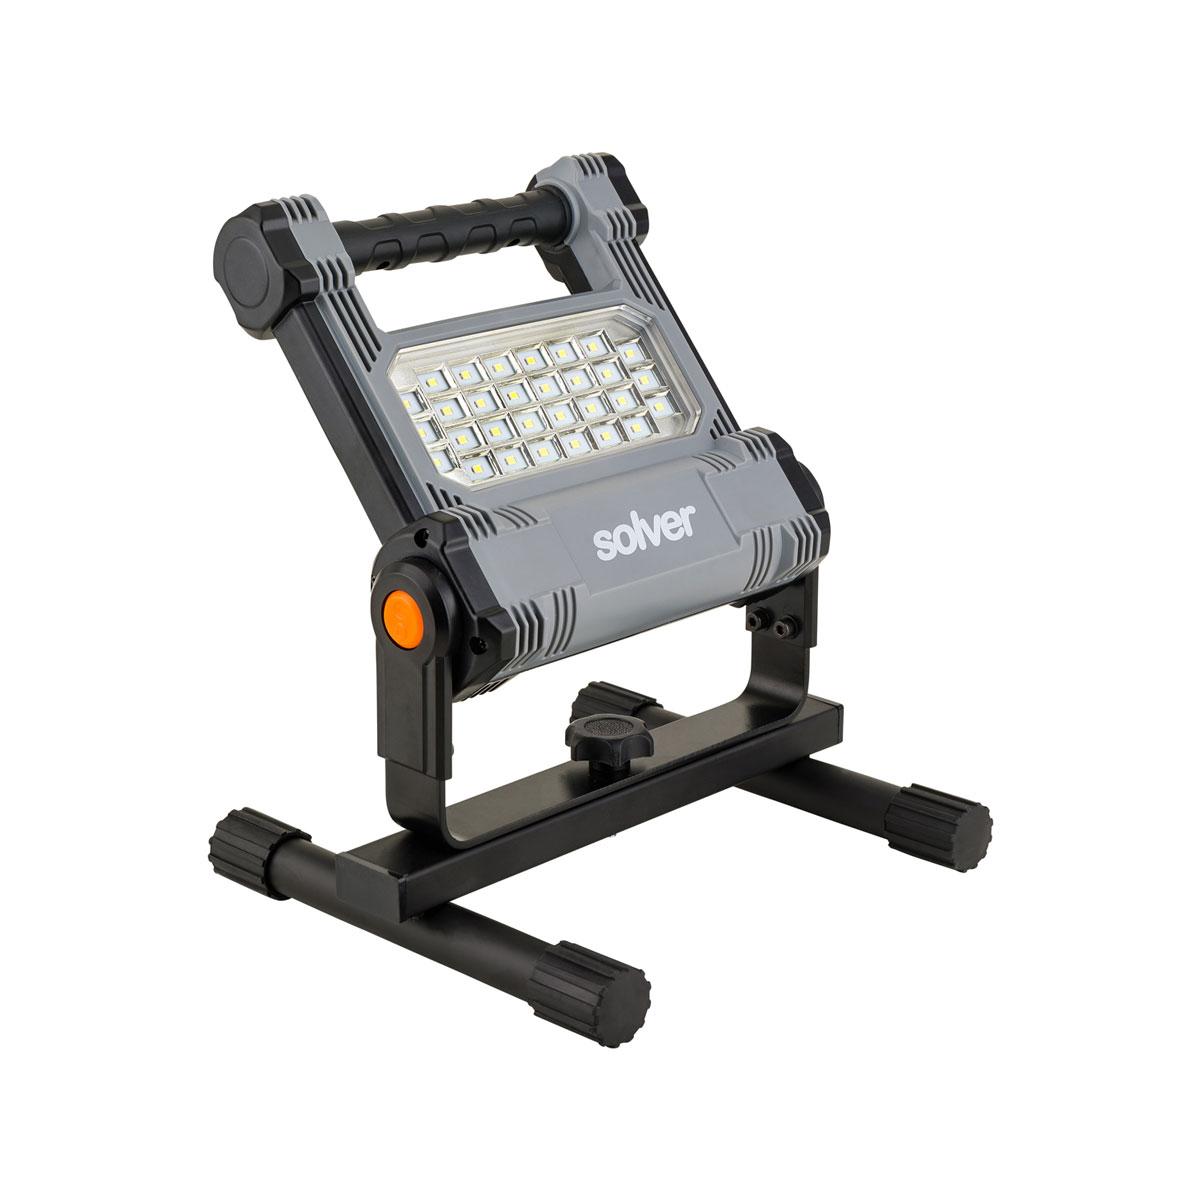 Refletor Portátil Recarregável SLP-501 LED - Solver